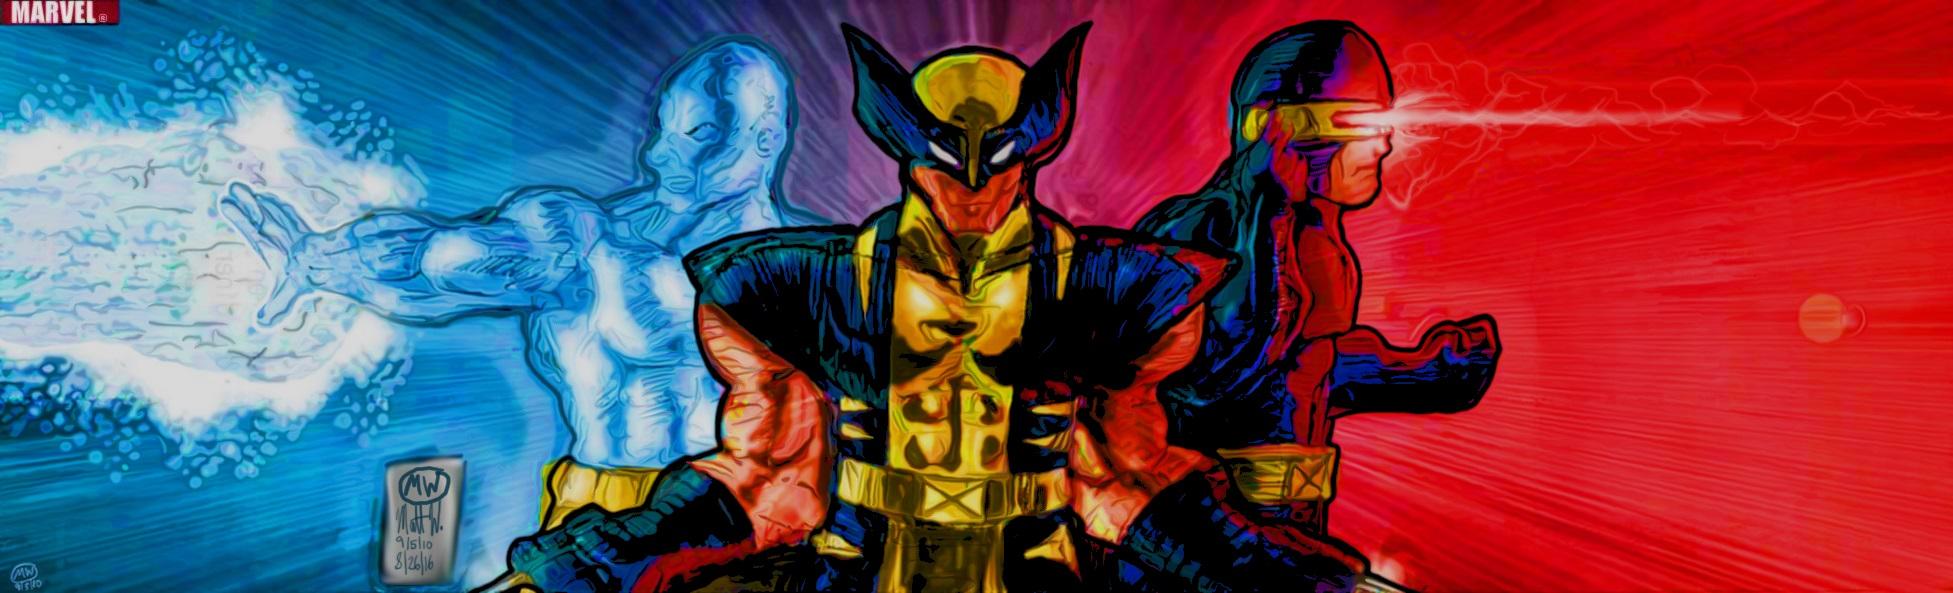 Iceman, Wolverine, Cyclops